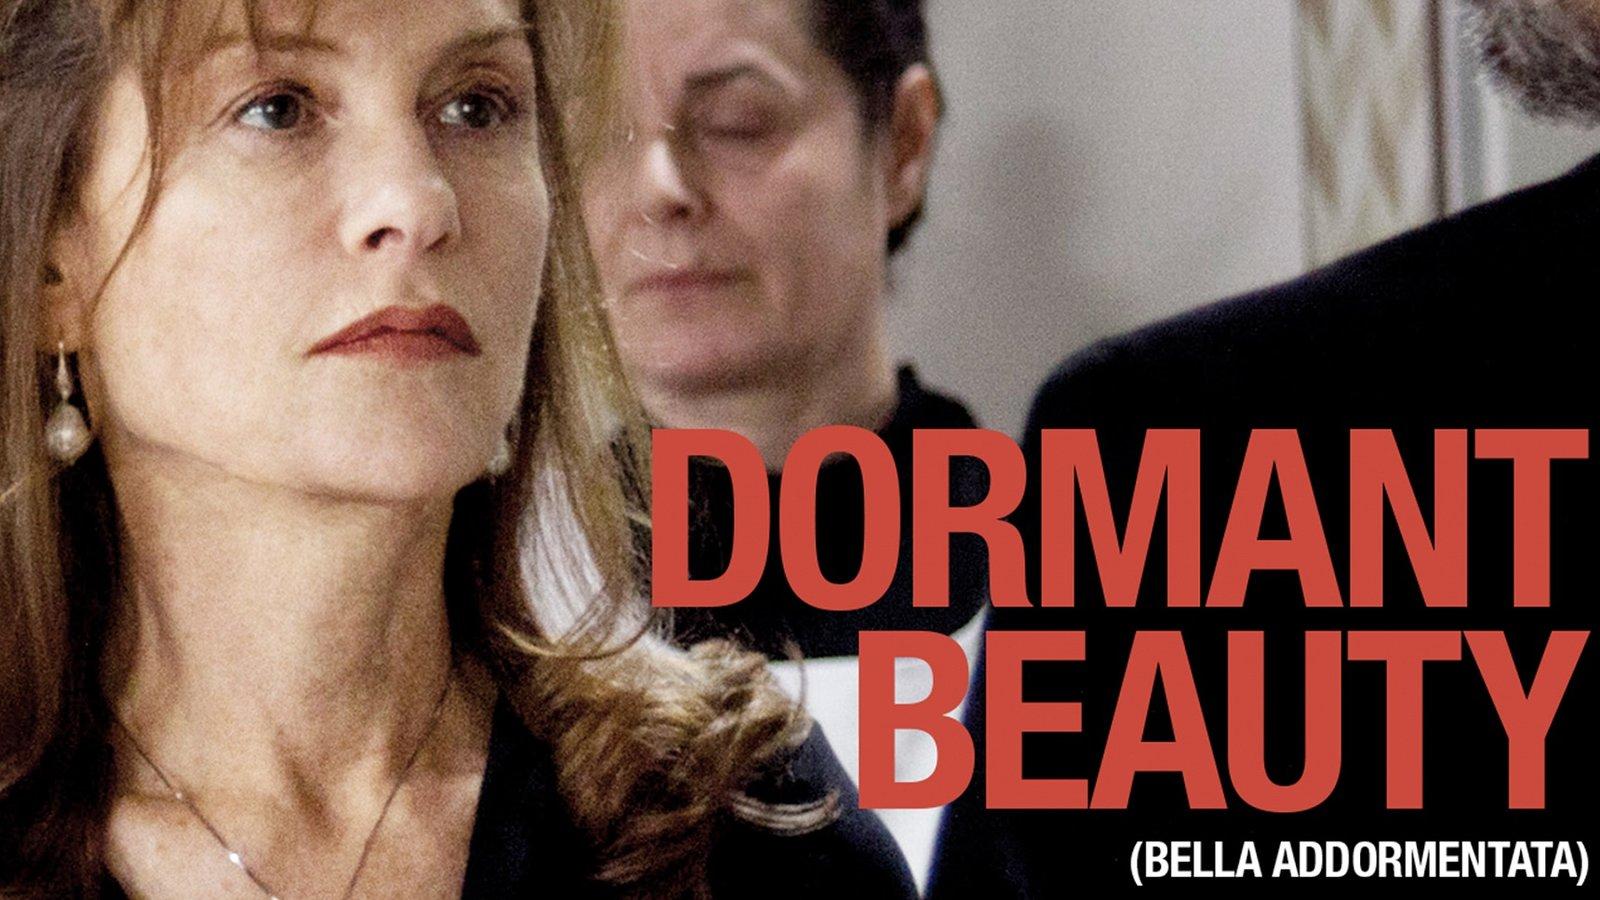 Dormant Beauty - Bella addormentata